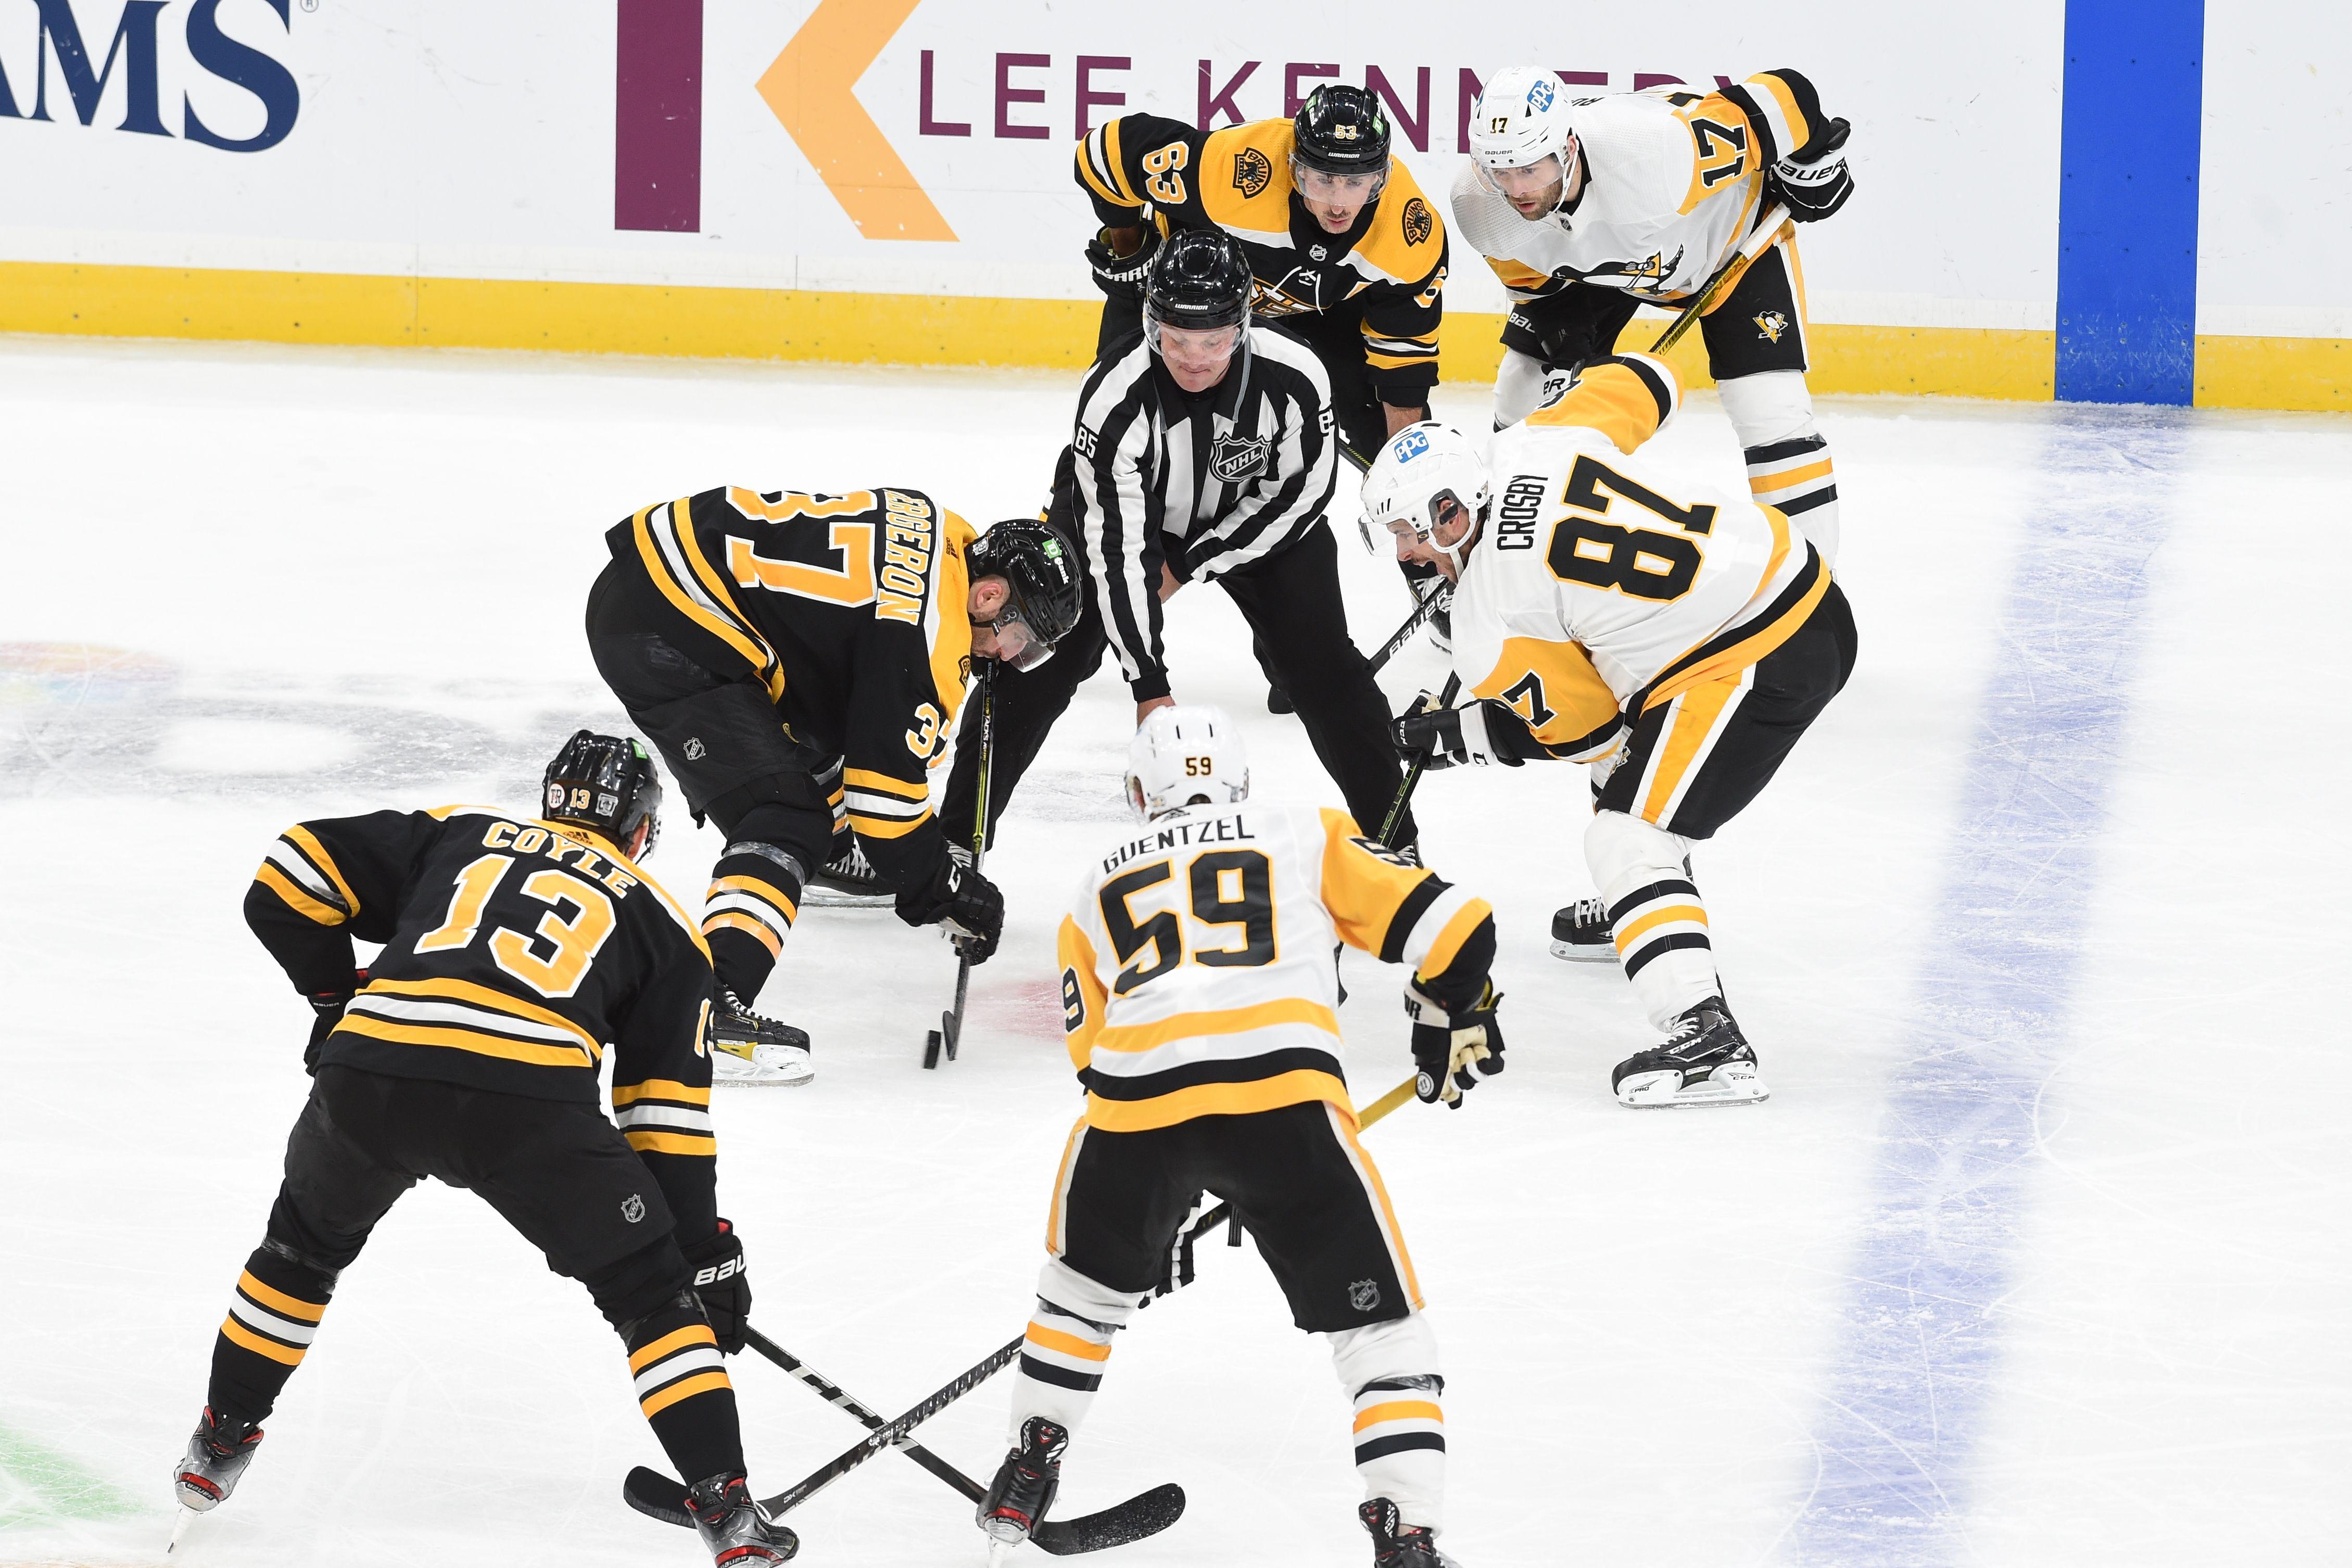 01 28 21 At Bos In 2021 Patrice Bergeron Pittsburgh Penguins Patrice